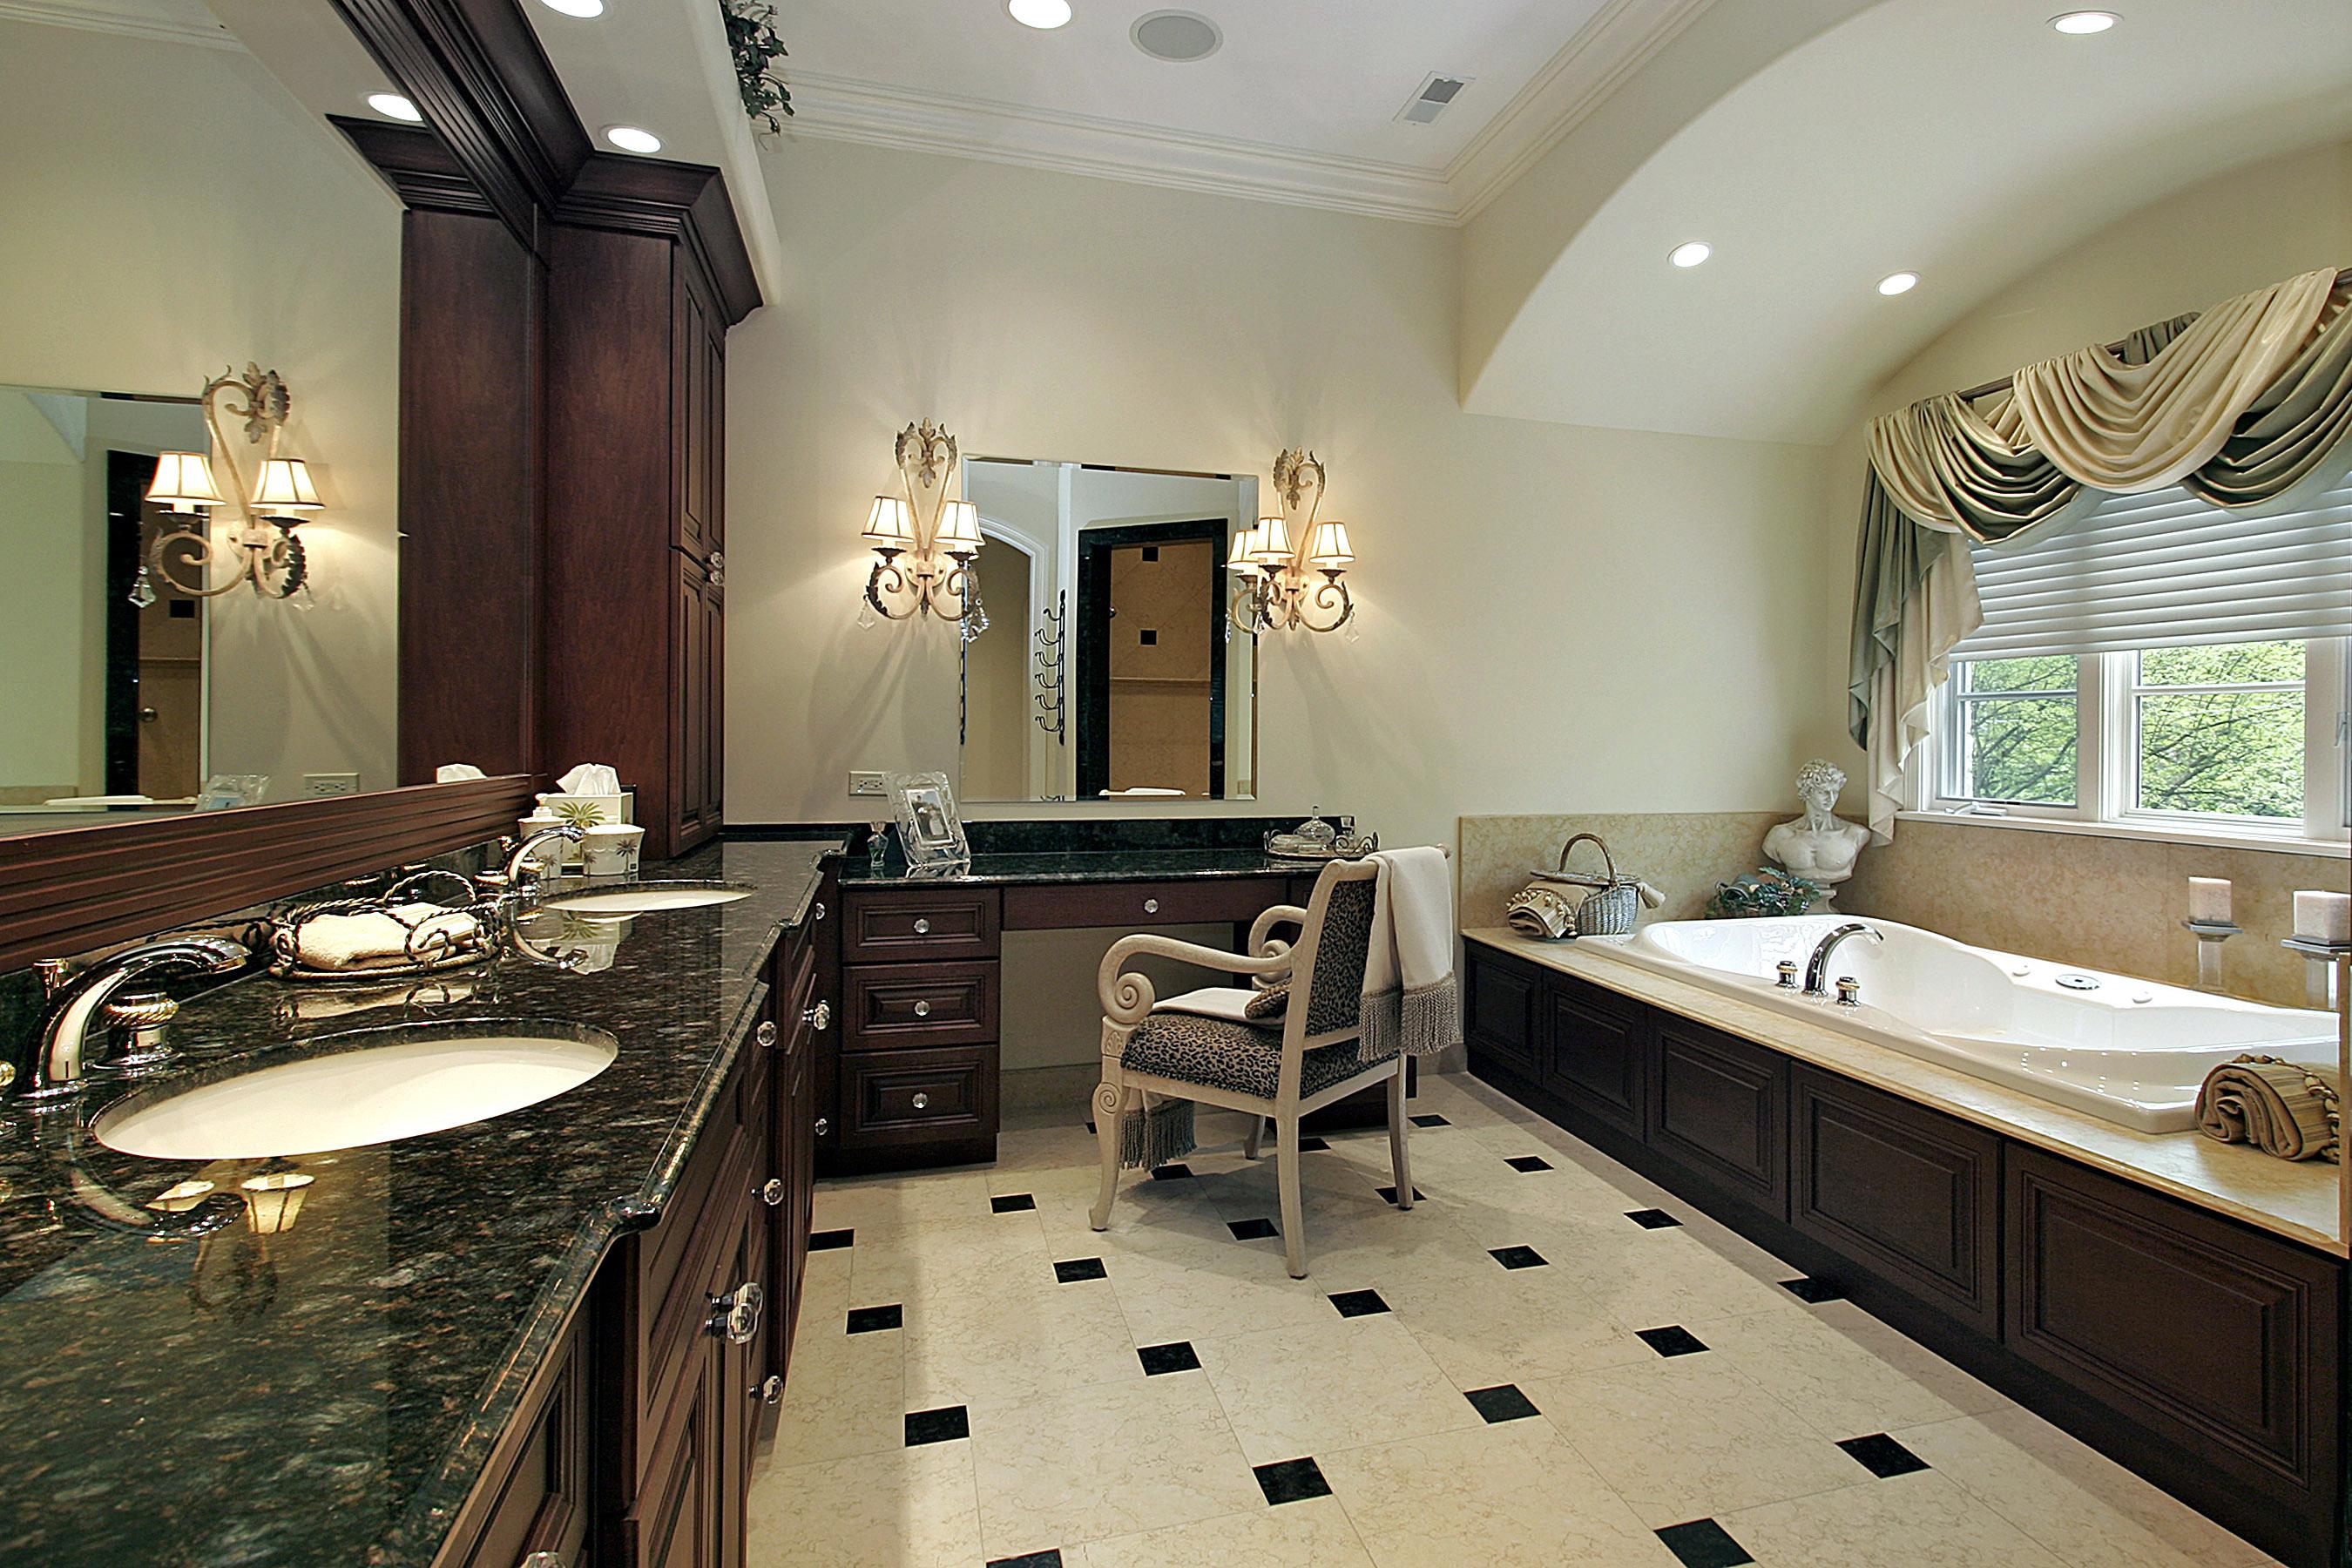 bigstock-Master-Bath-In-Luxury-Home-5147928